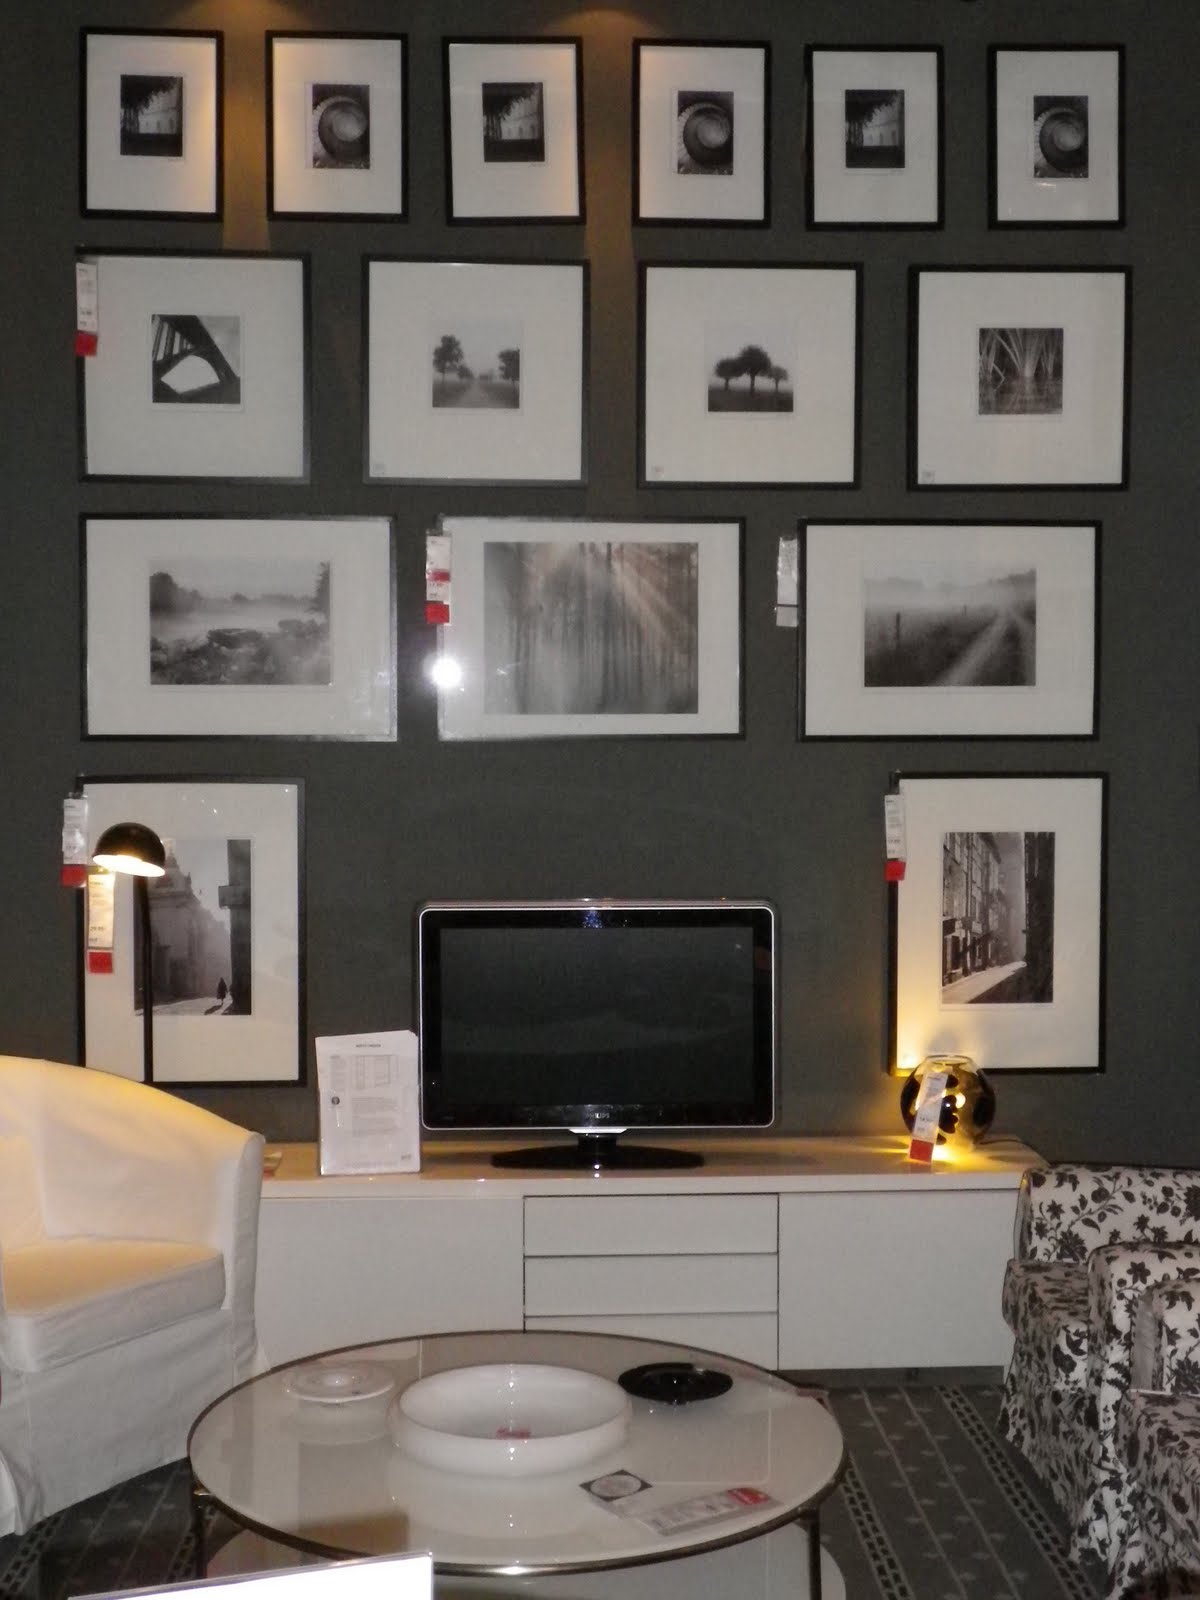 Comprar ofertas platos de ducha muebles sofas spain - Composicion salon ikea ...